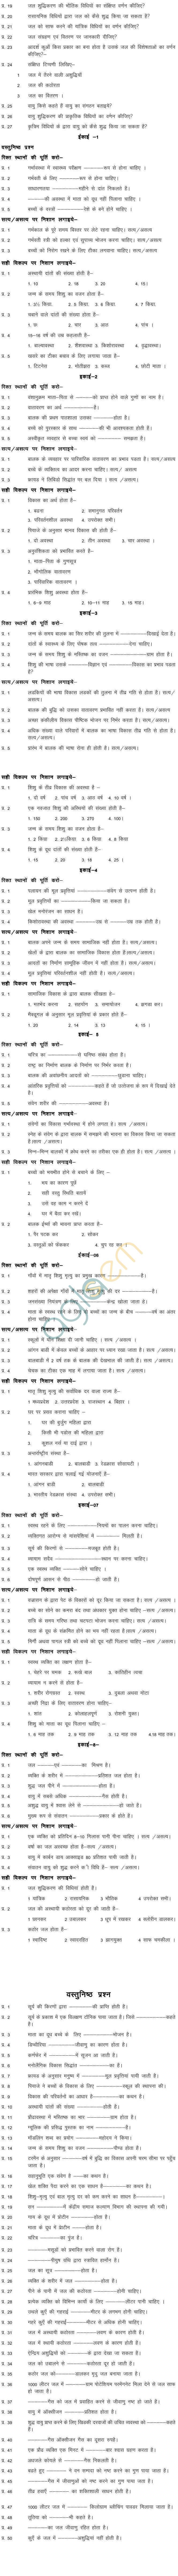 Chhattisgarh Board Class 11 Question Bank - Matritva Kala, Health & care